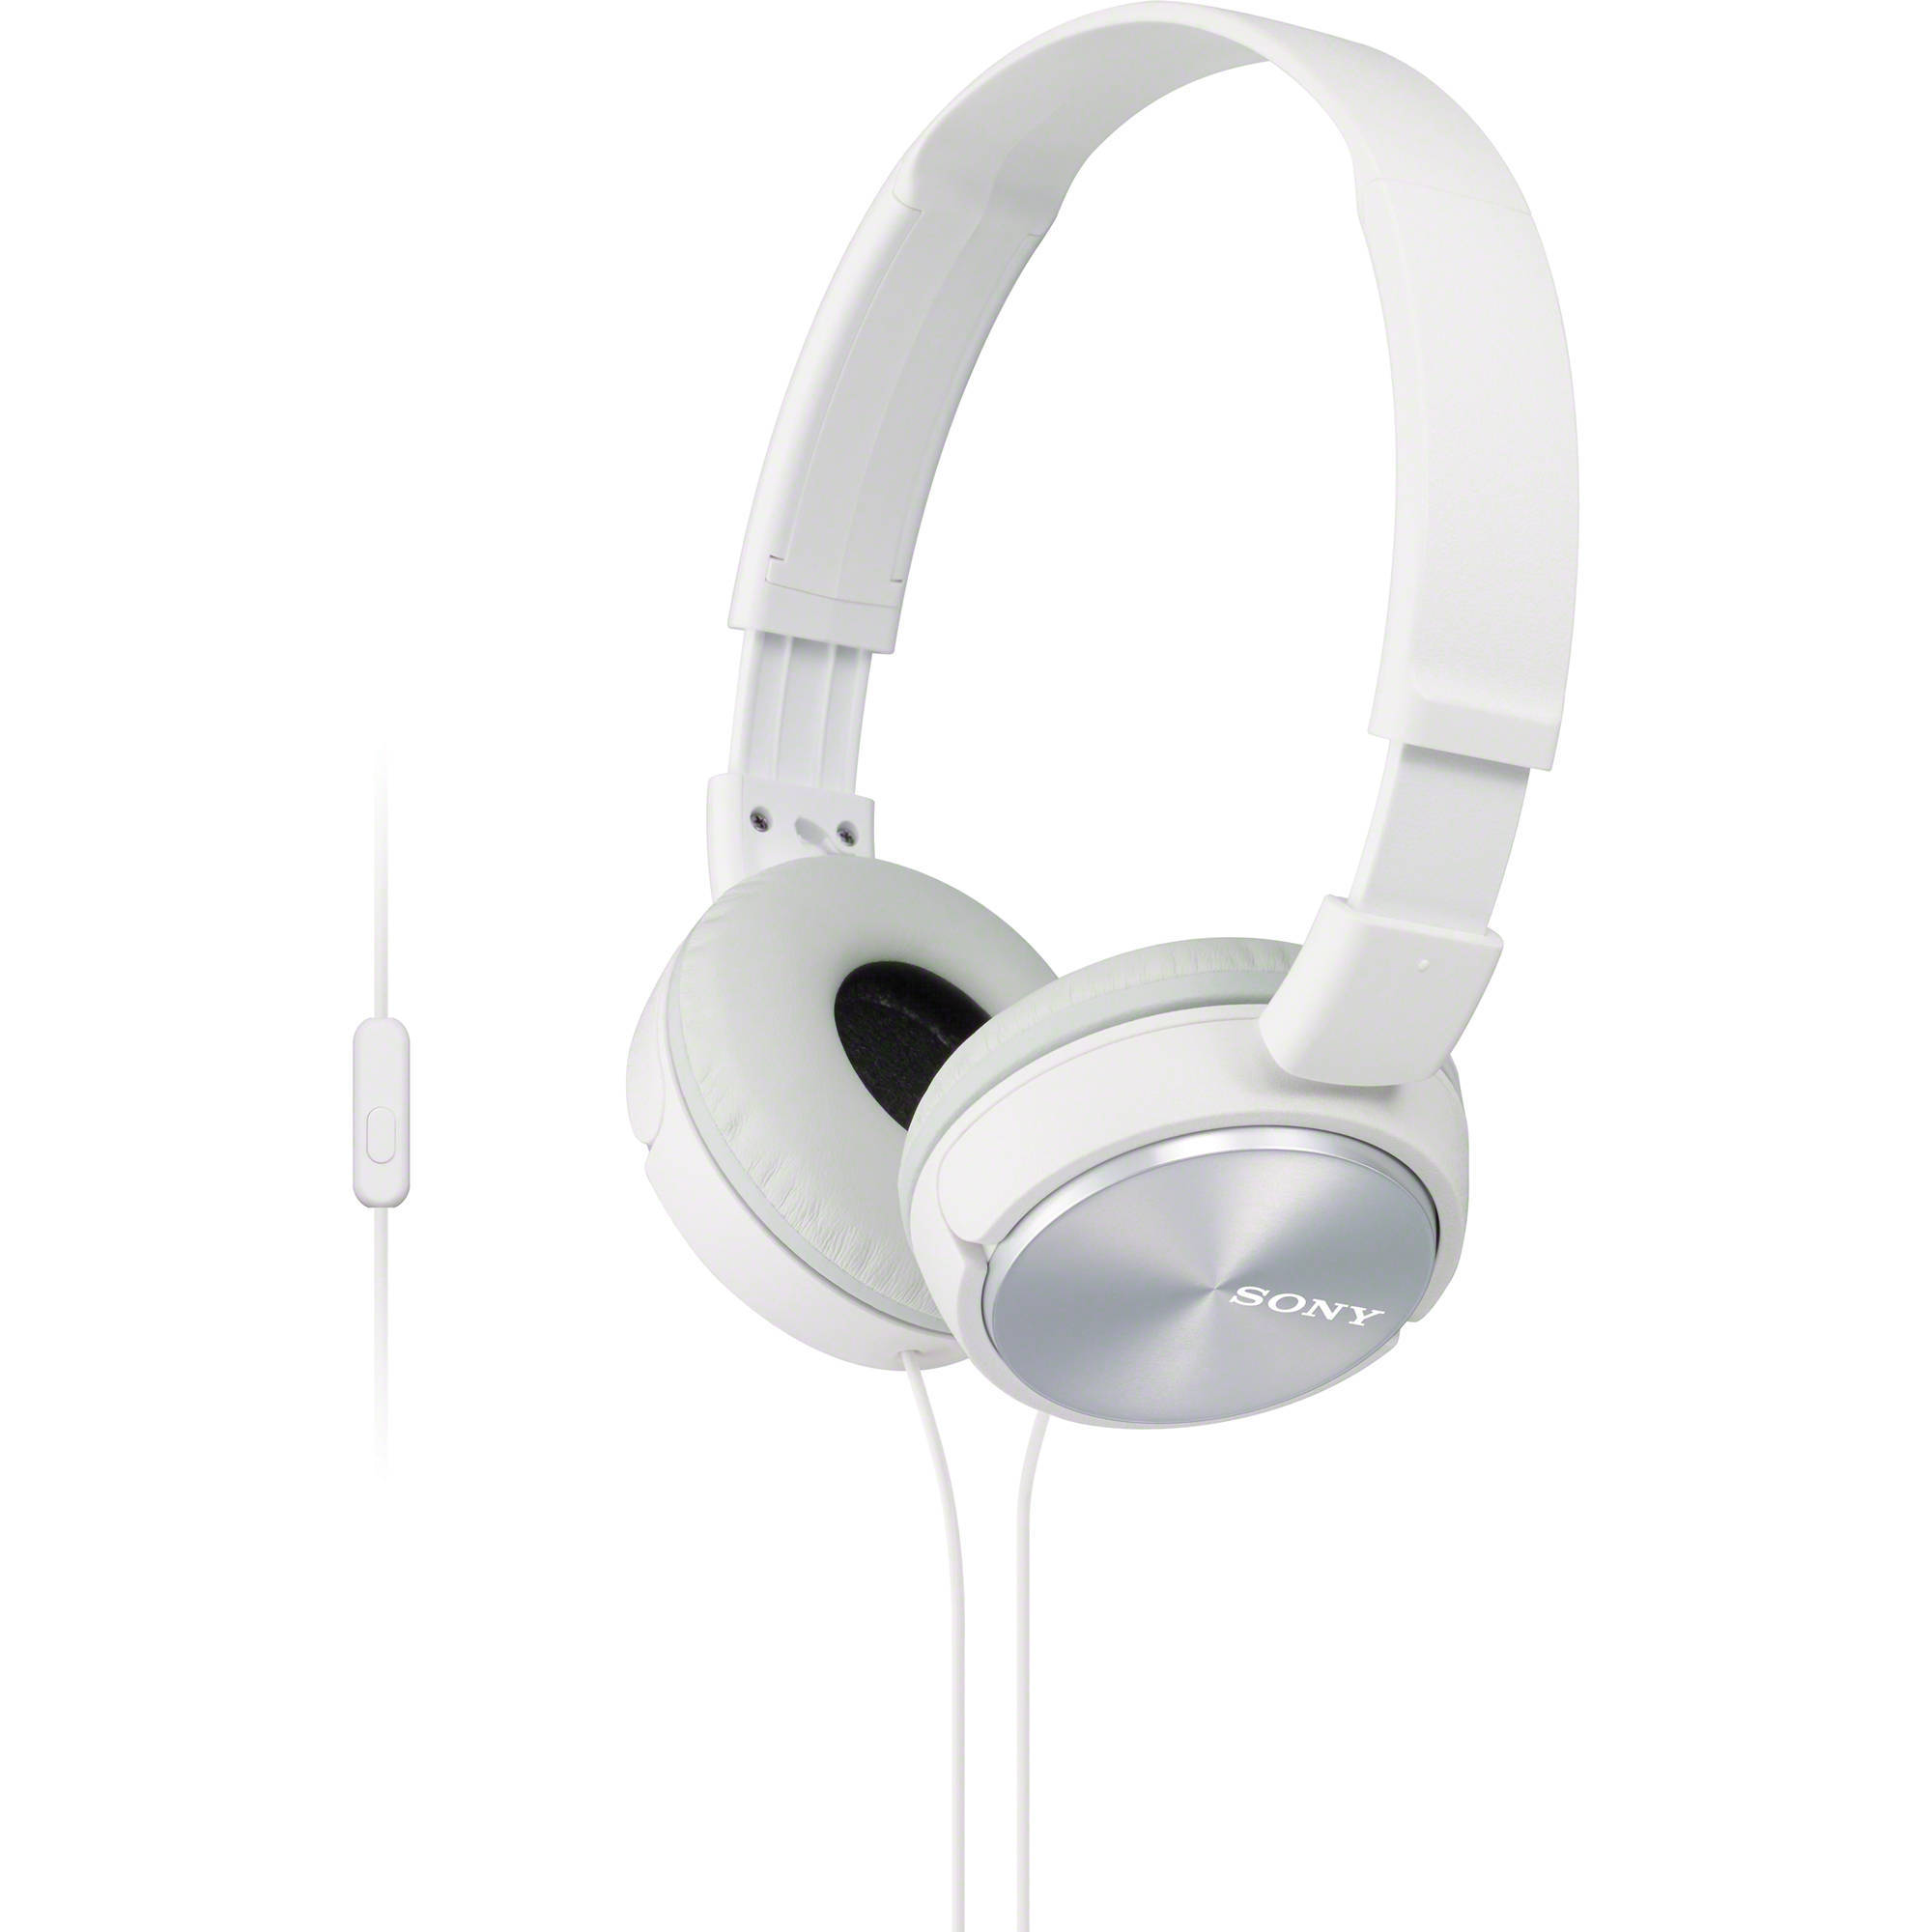 MDR-ZX310AP W наушники Sony с микрофоном, белые